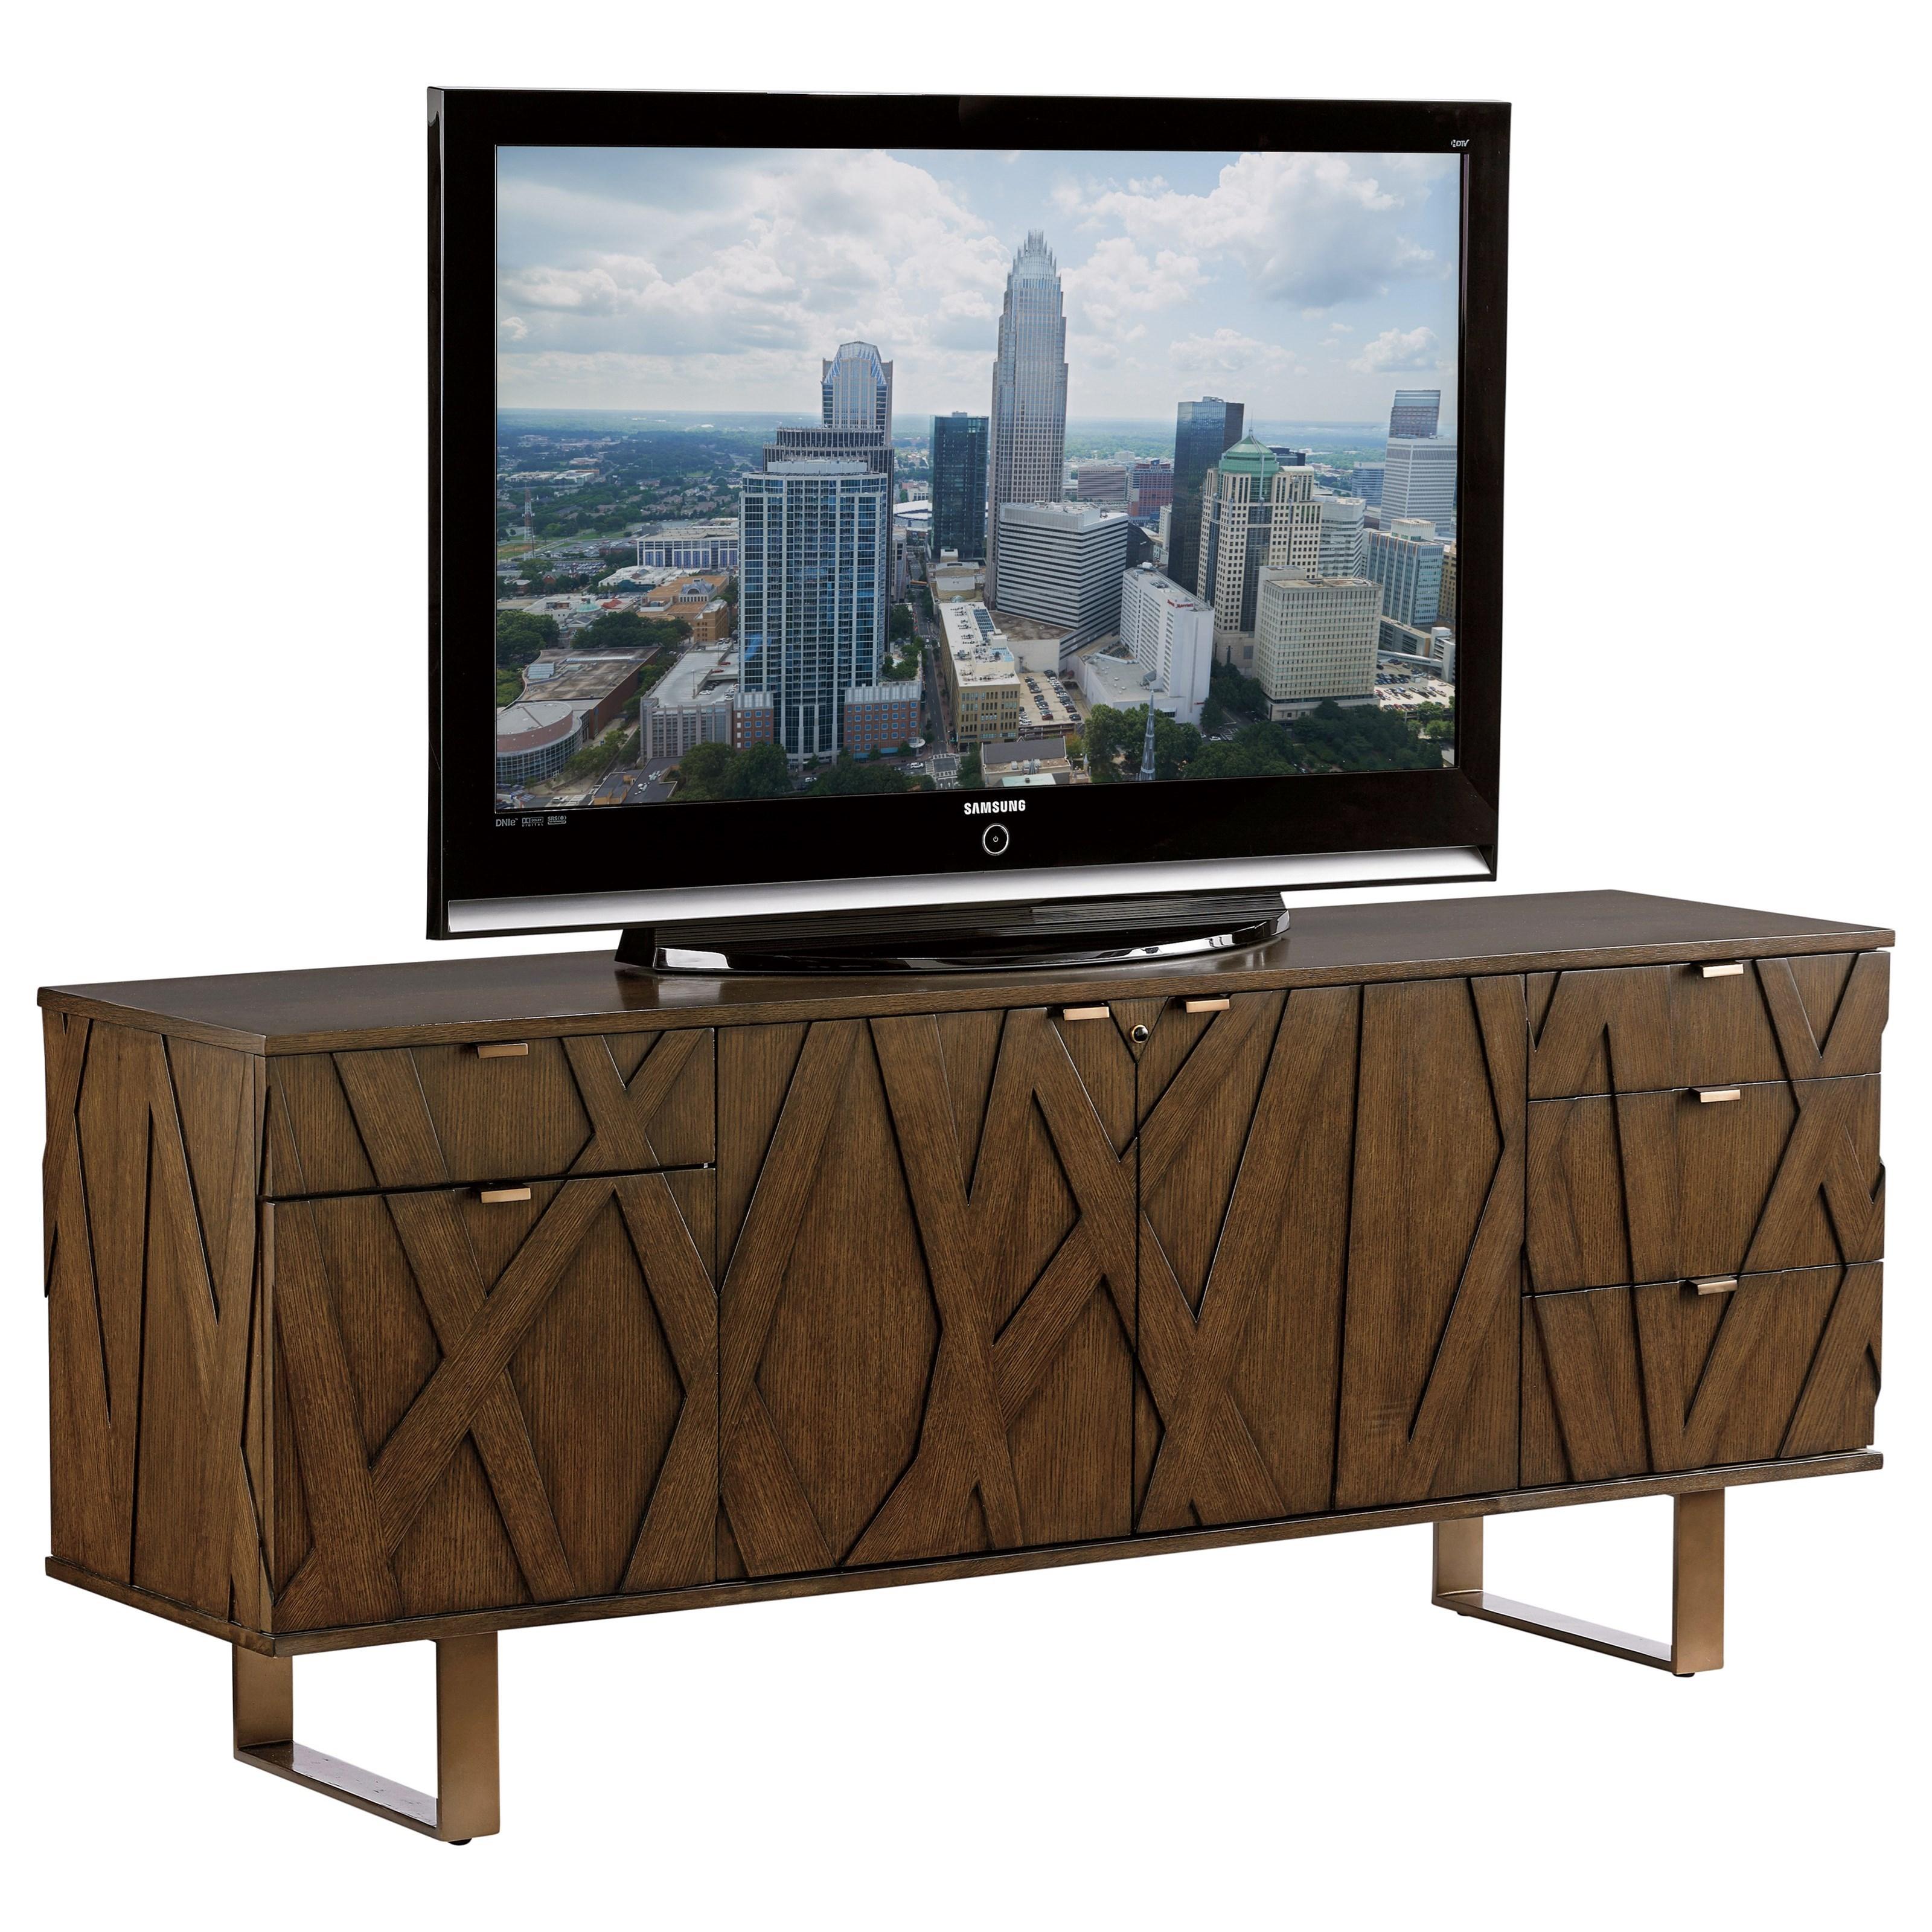 Cross Effect Modern Media Center with SmartEye by Sligh at Baer's Furniture